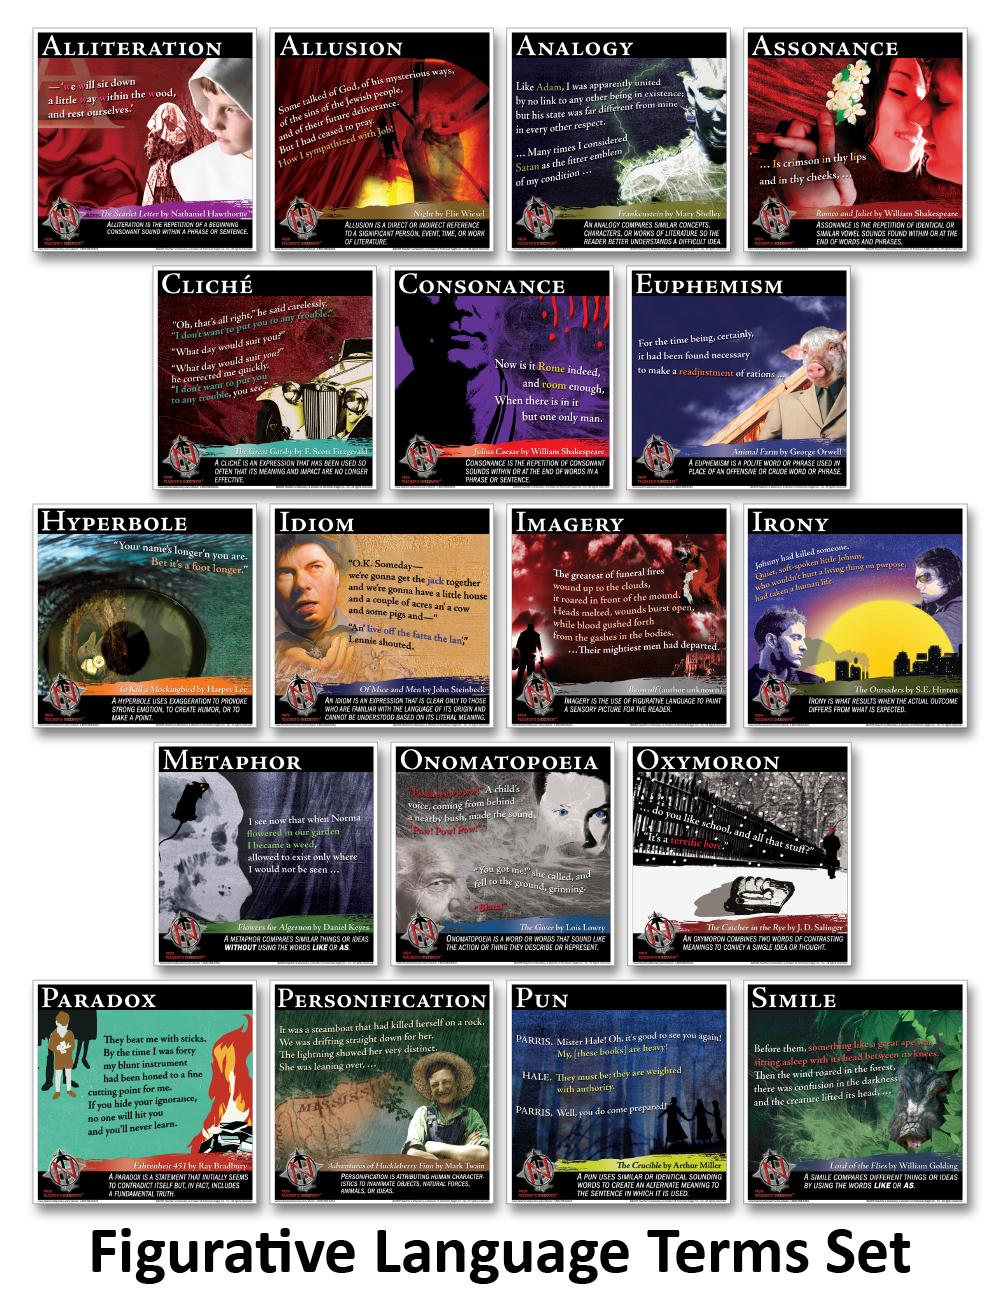 Novel Guide Figurative Language Mini-Poster Set - Novel Guide Figurative Language Mini-Poster Set of 18 Print Posters